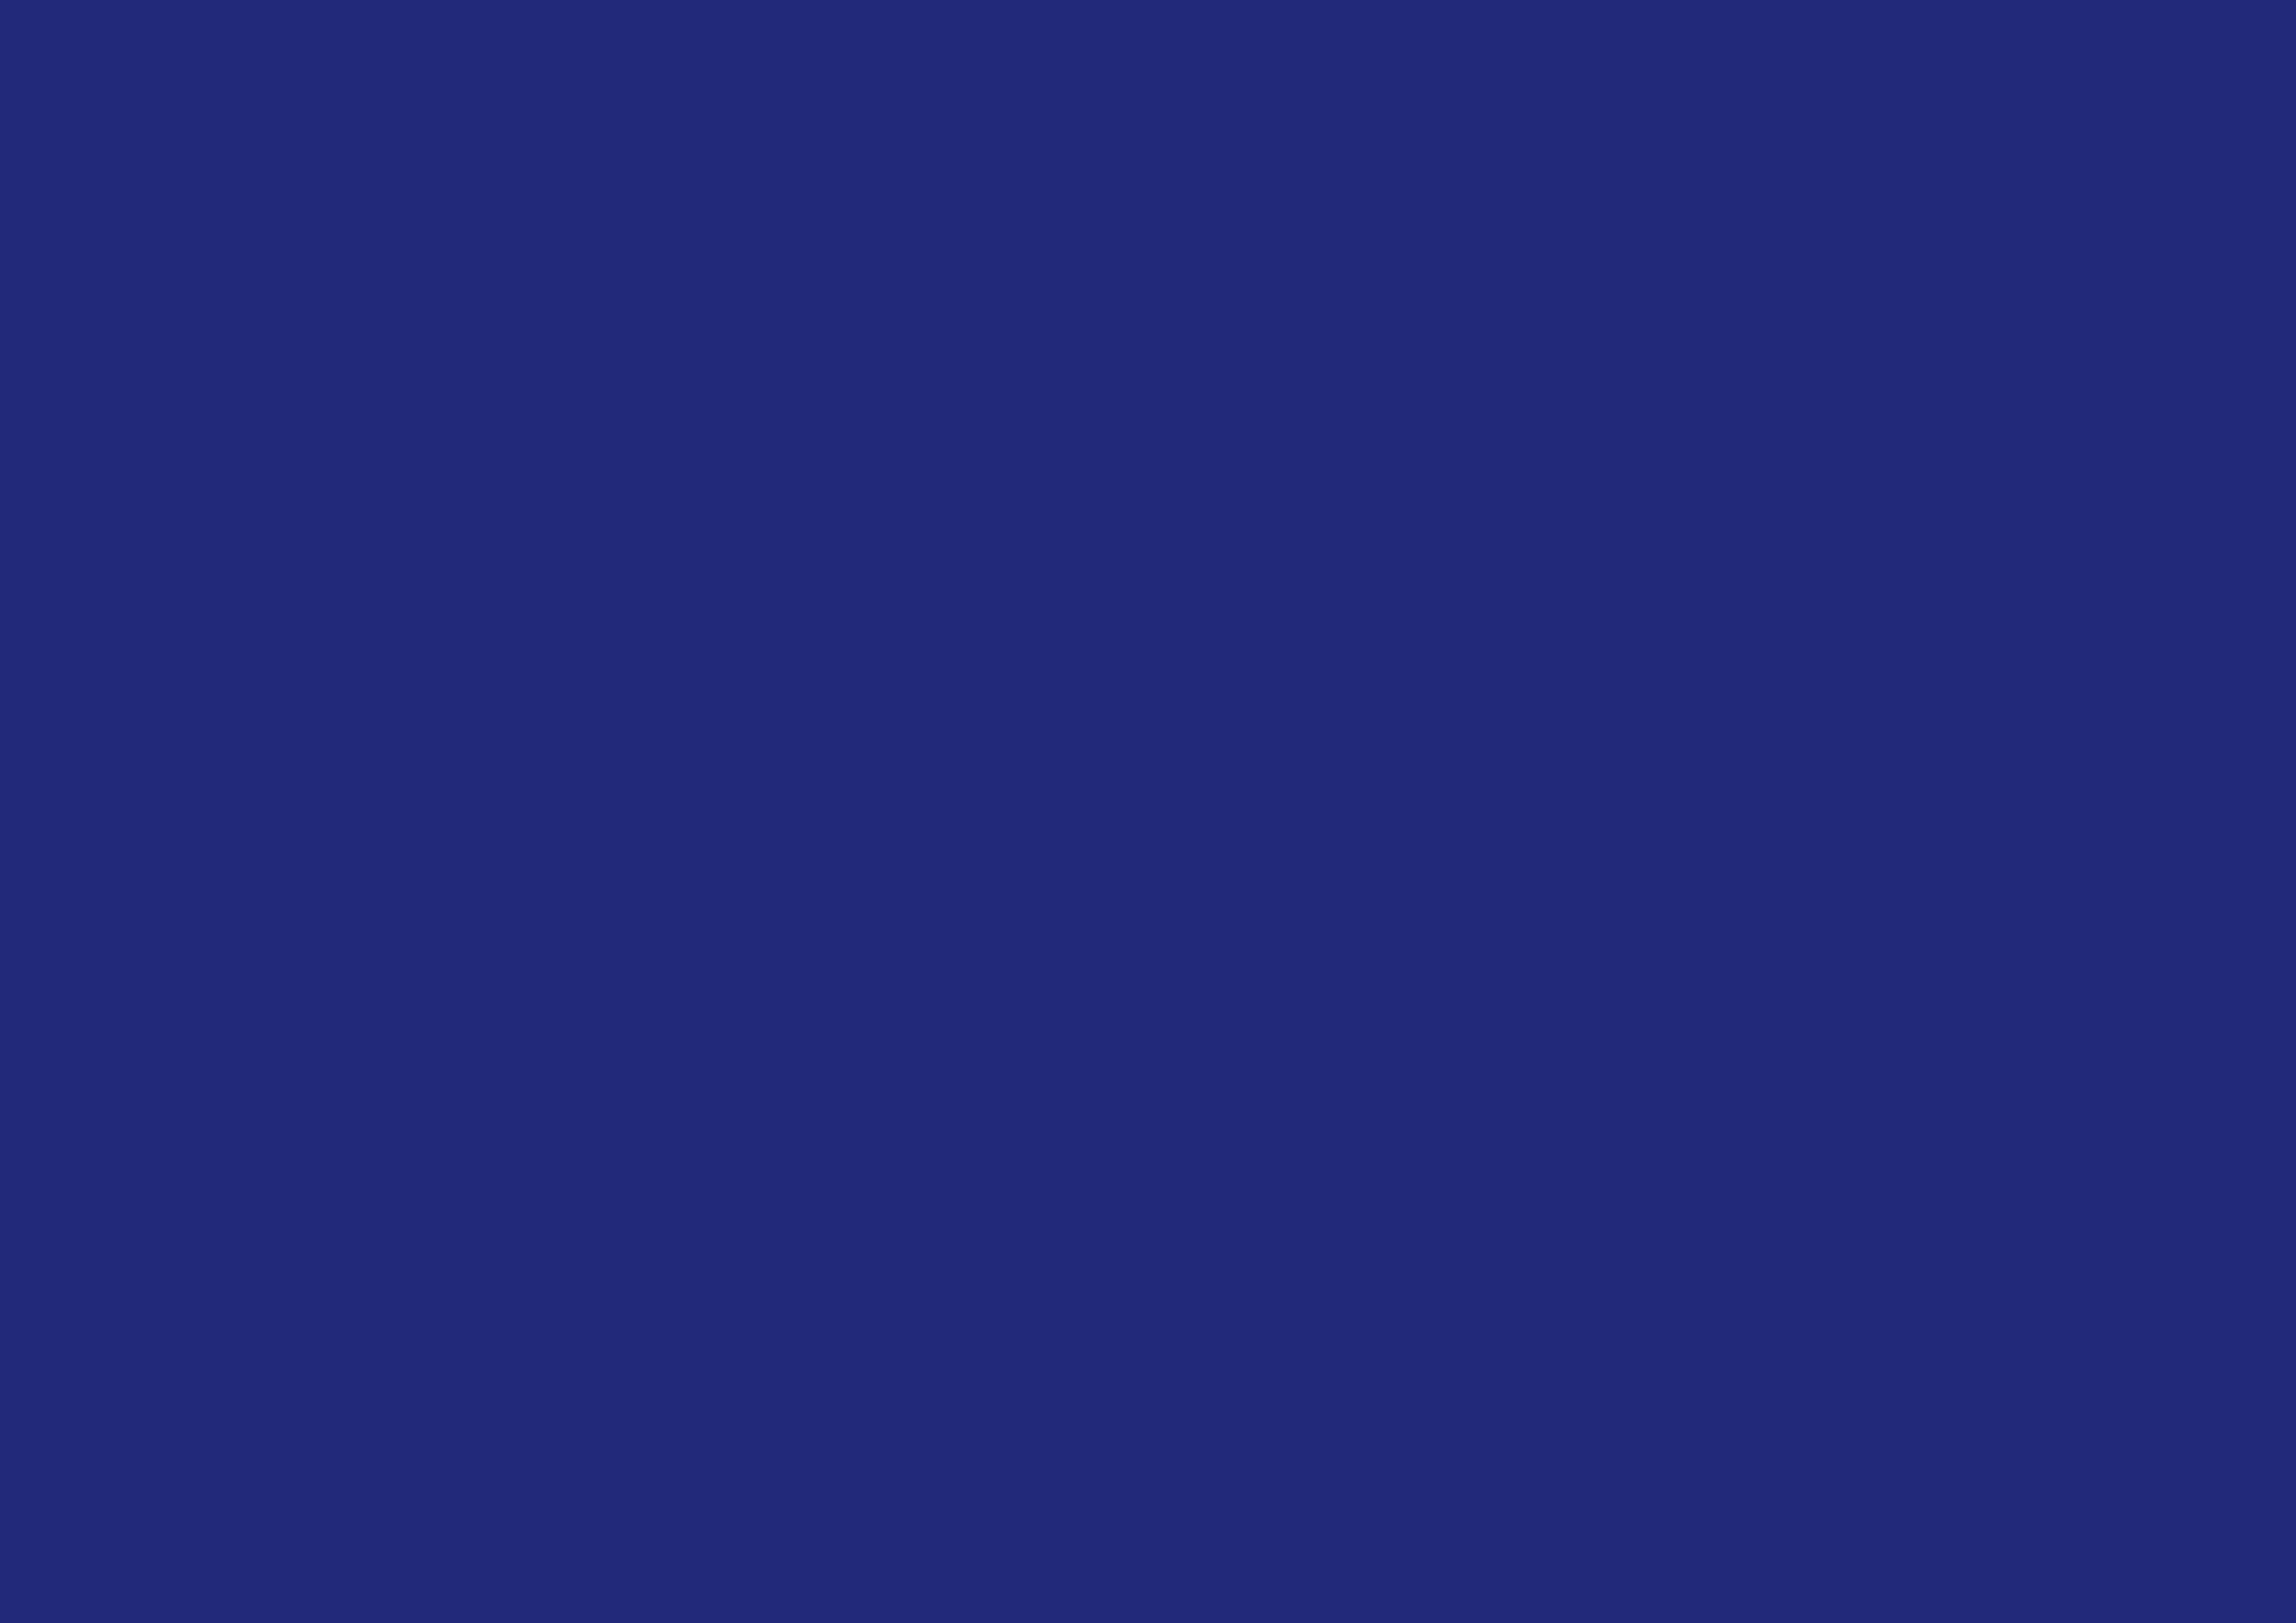 3508x2480 St Patricks Blue Solid Color Background